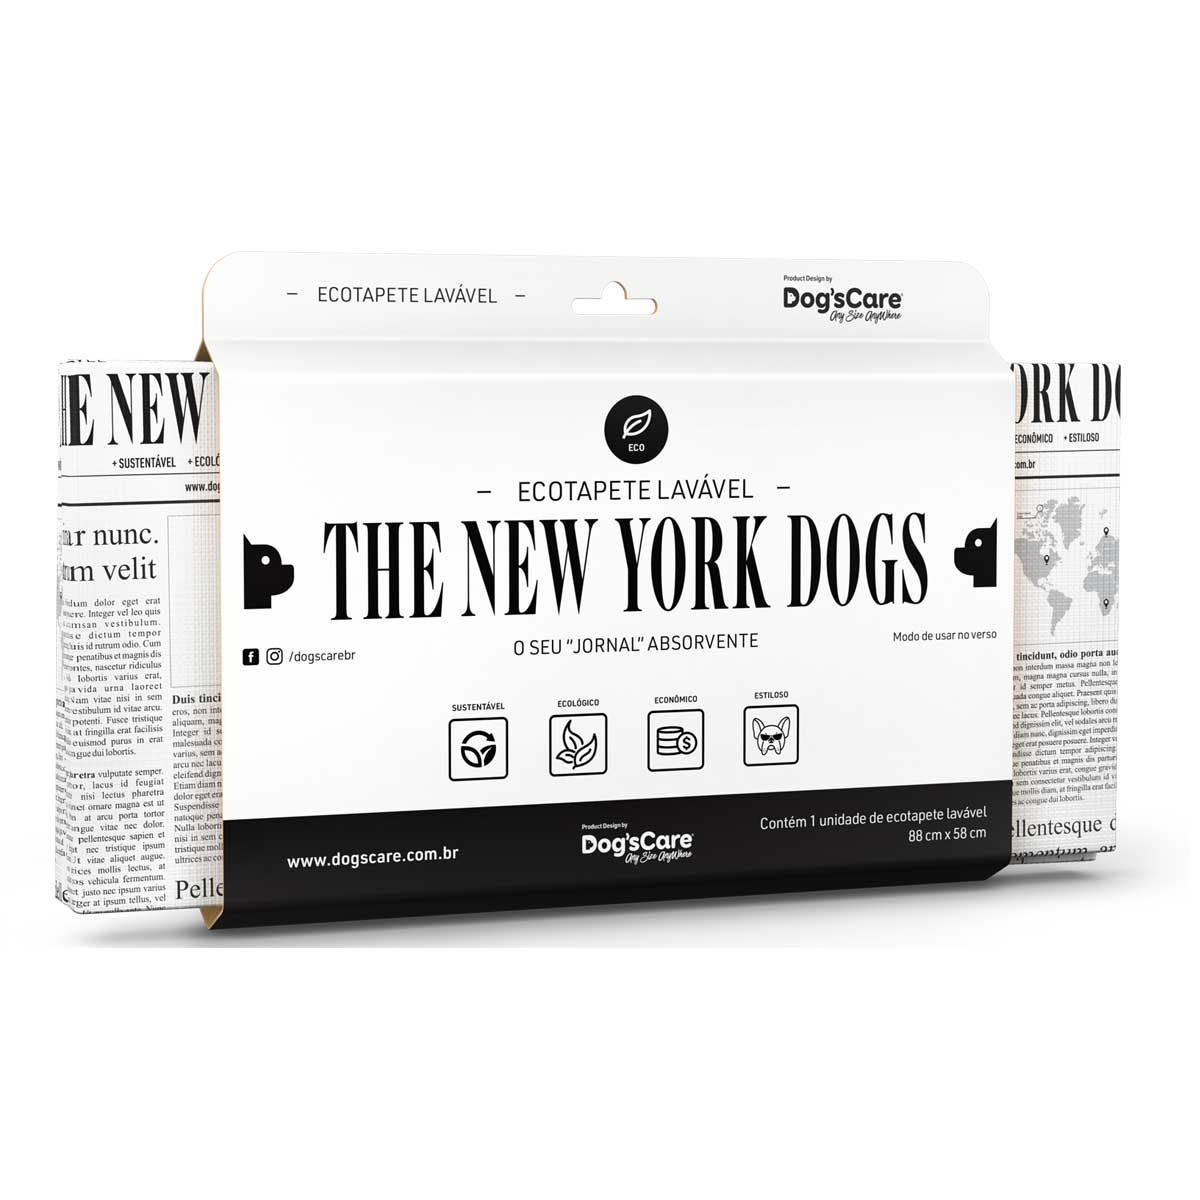 ECOTAPETE HIGIÊNICO LAVÁVEL THE NEW YORK DOGS